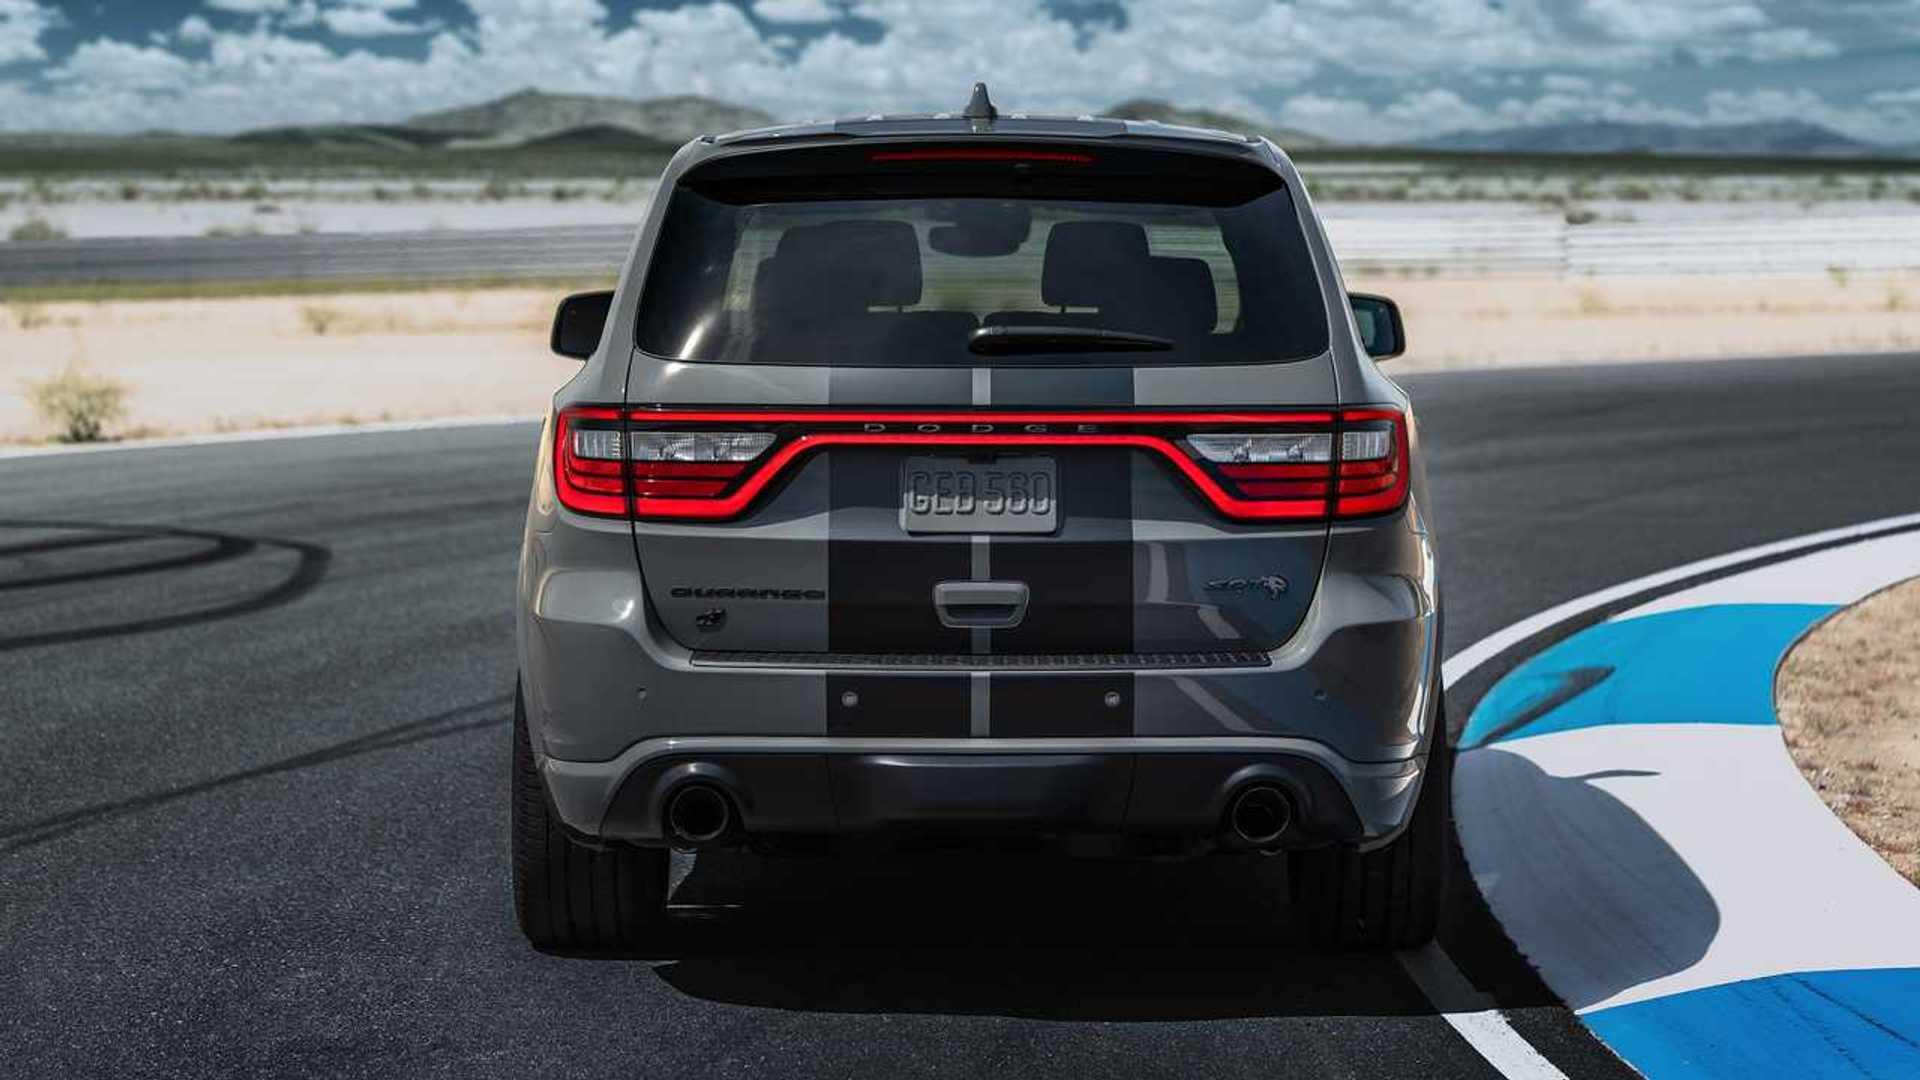 2021 Dodge Durango SRT Hellcat